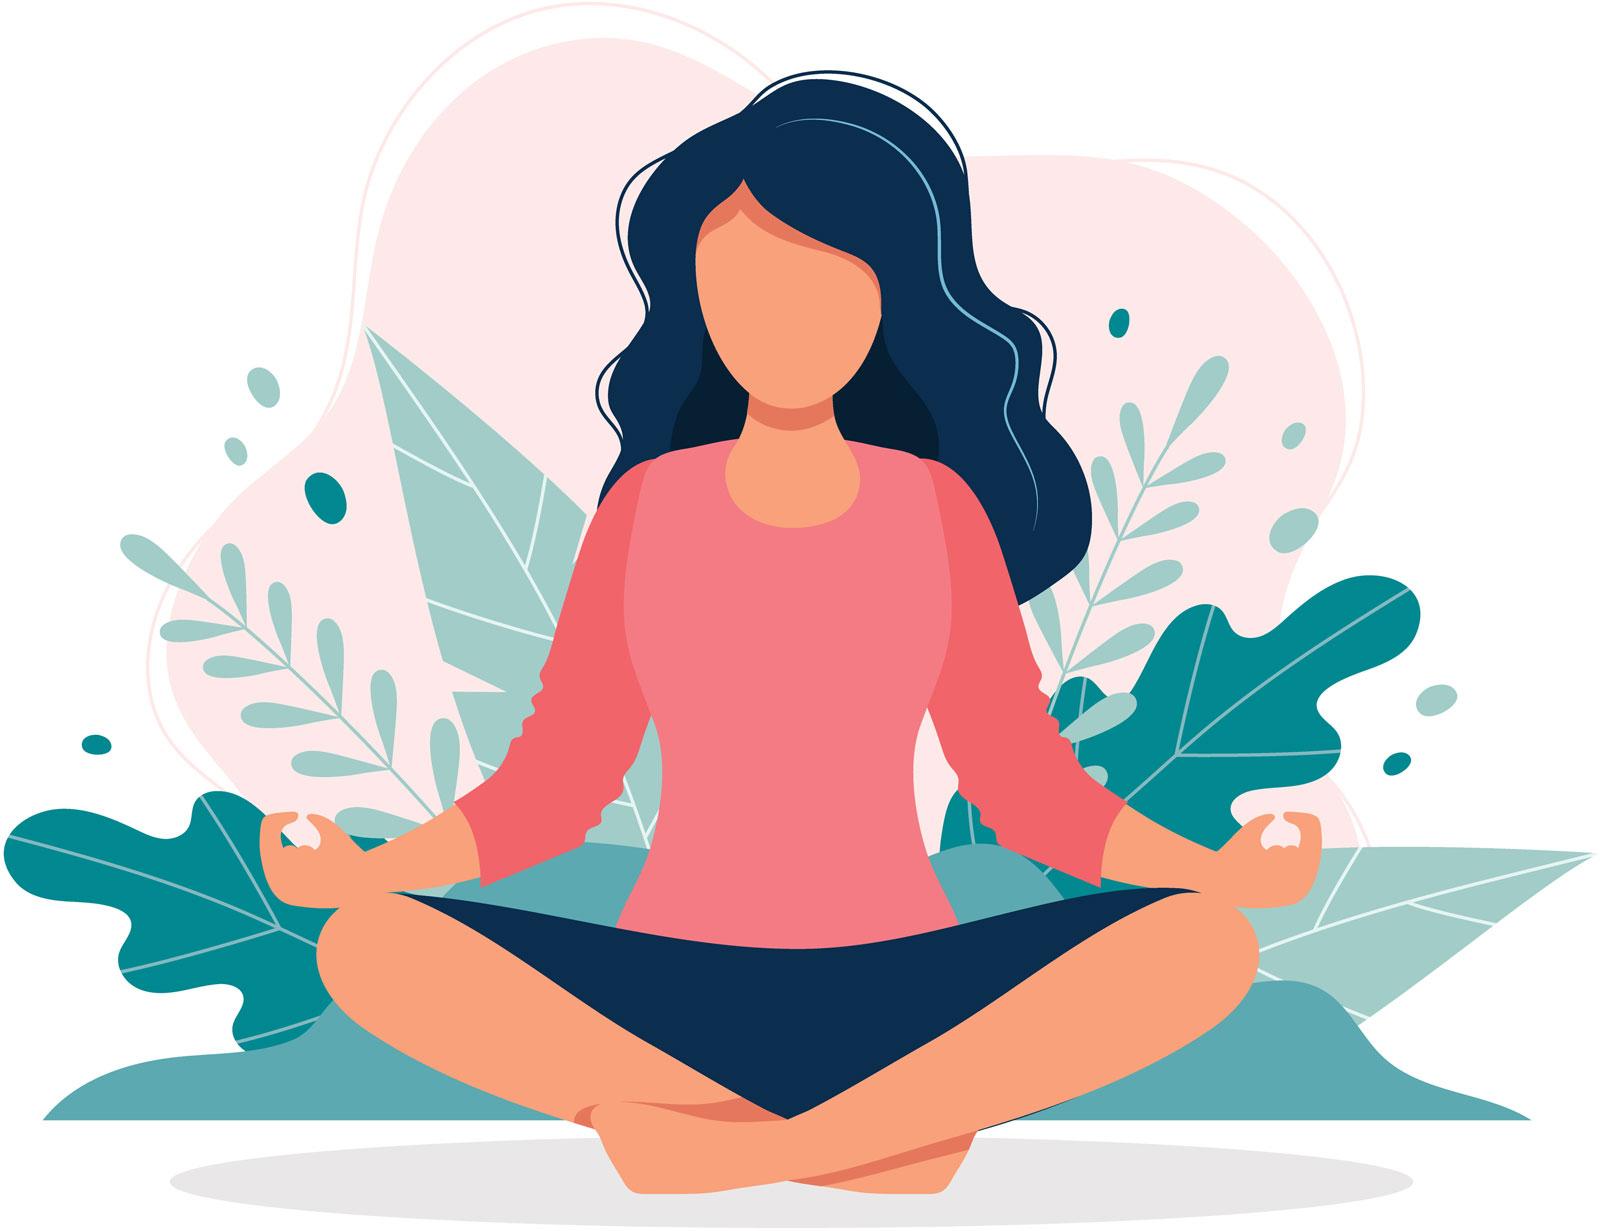 lady_meditate_1.jpg